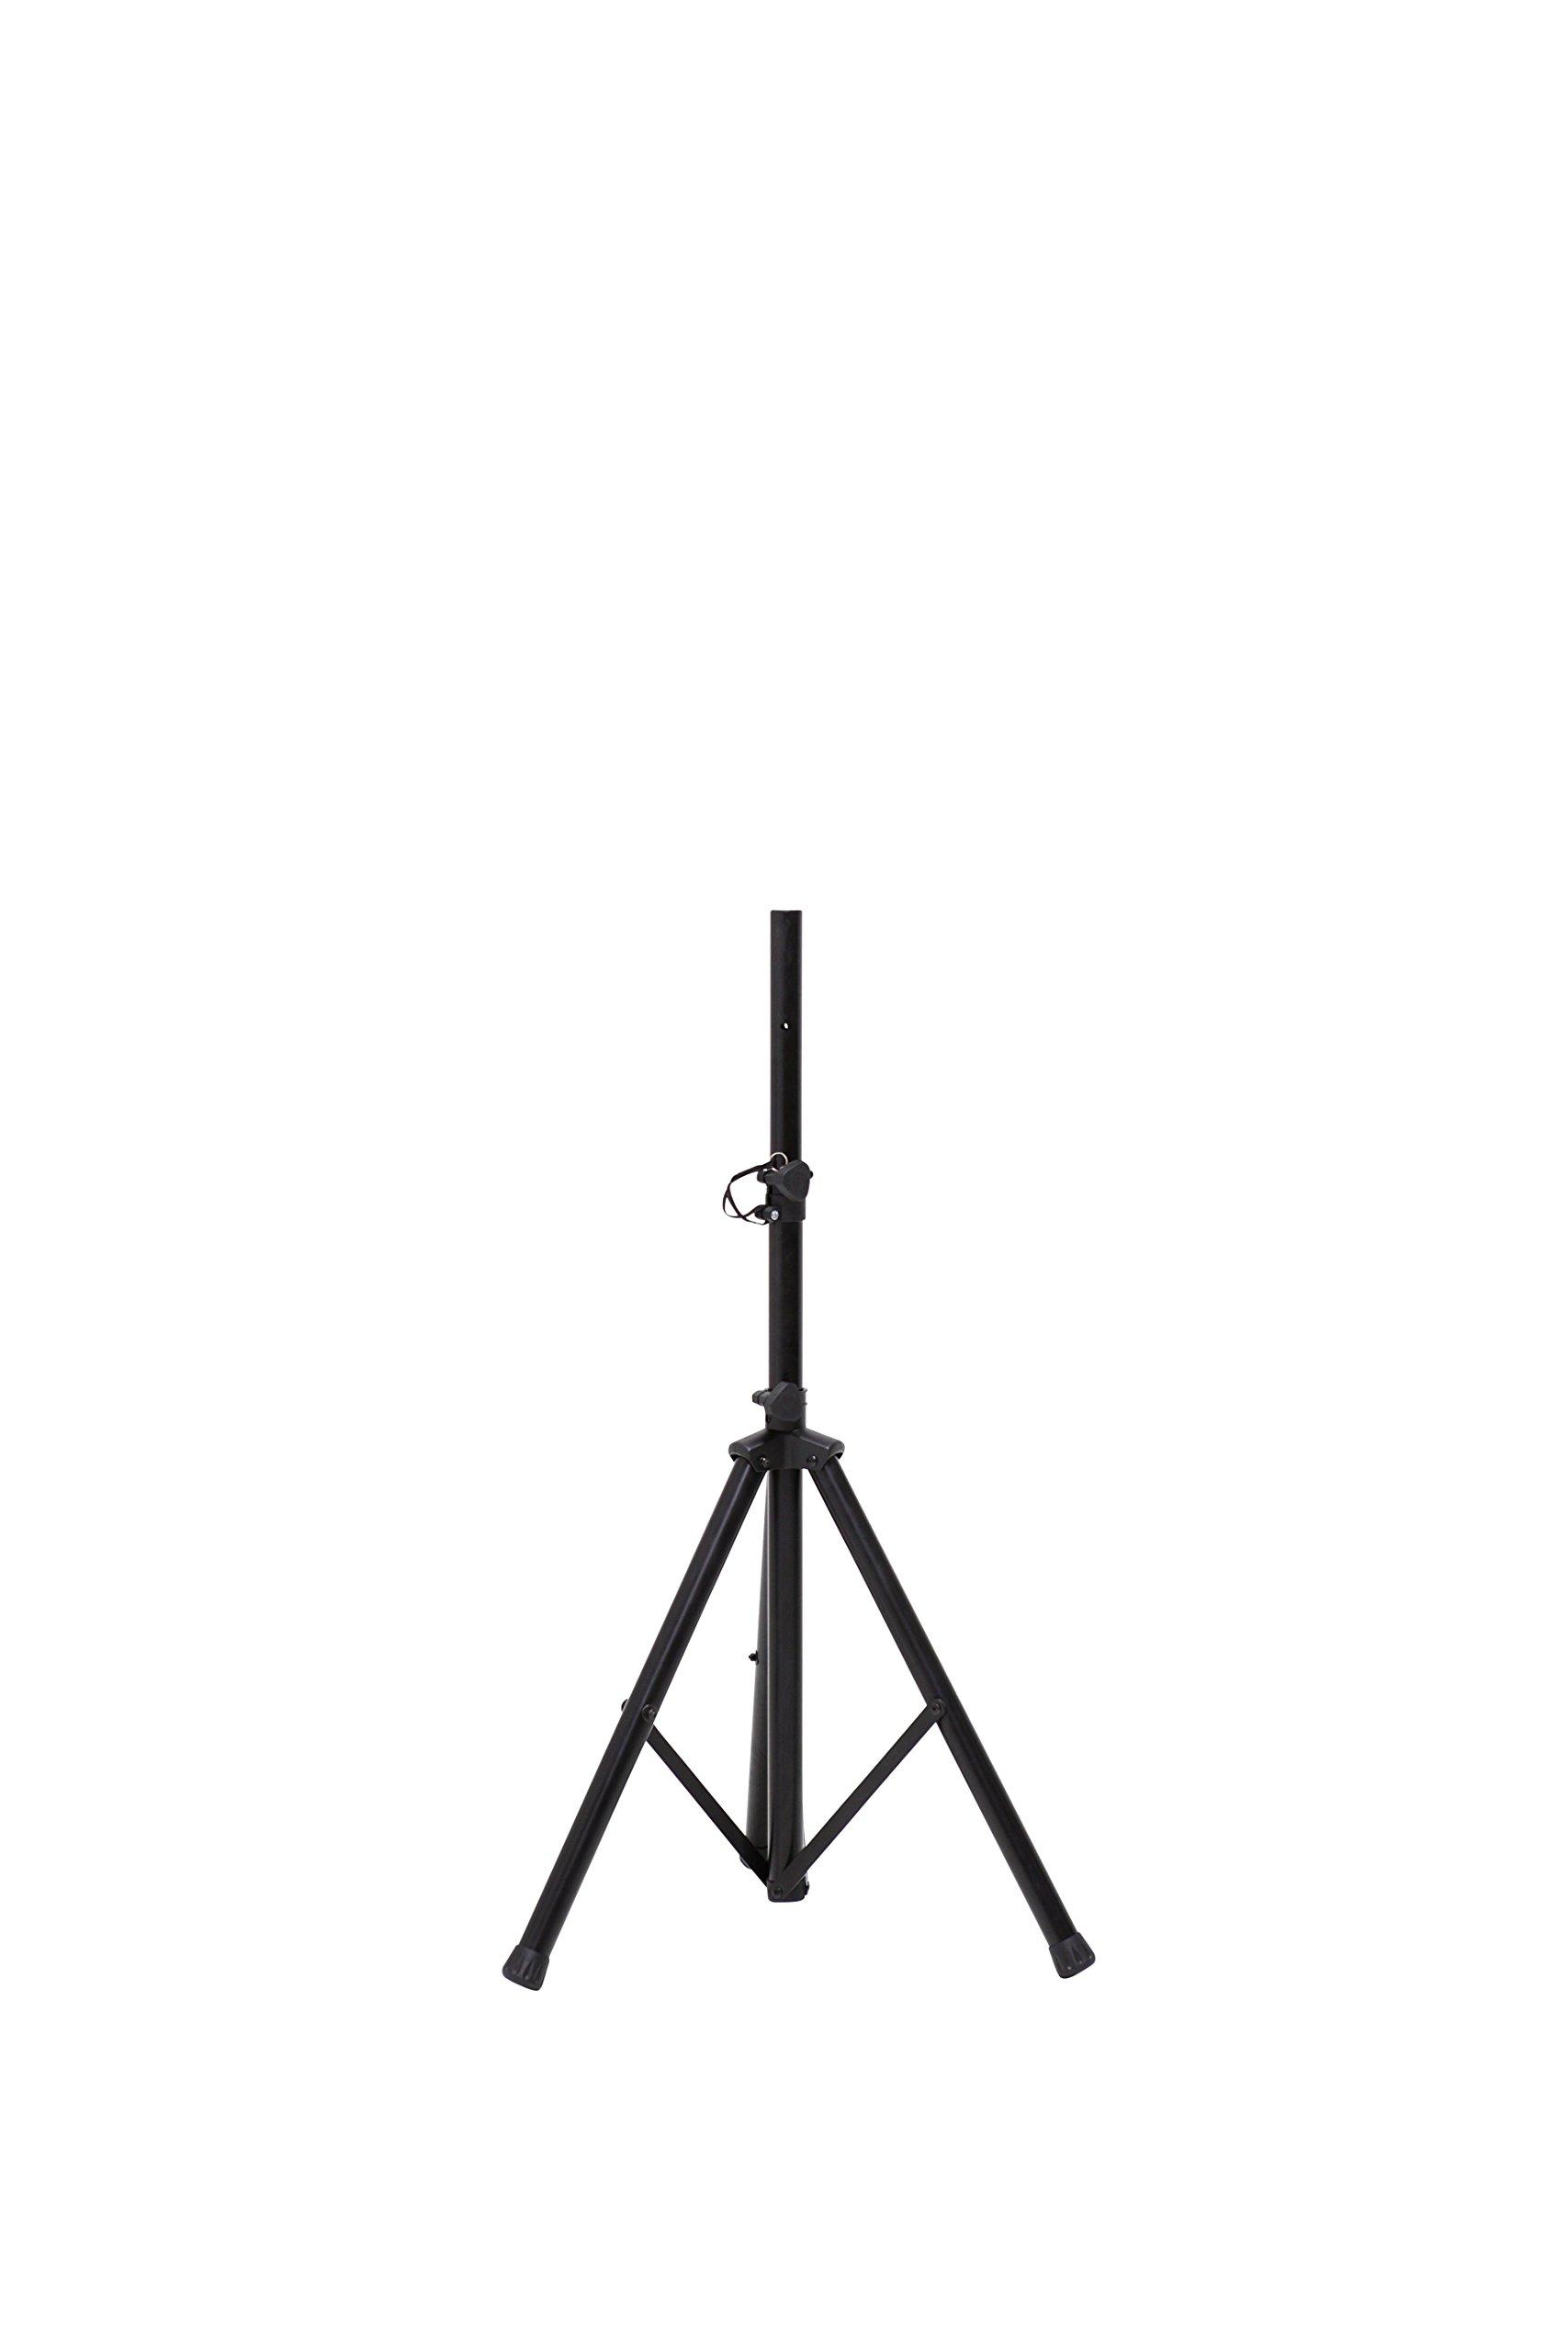 Blackmore BJST-60KG DJ Speaker Stand 60kg Weight Capacity